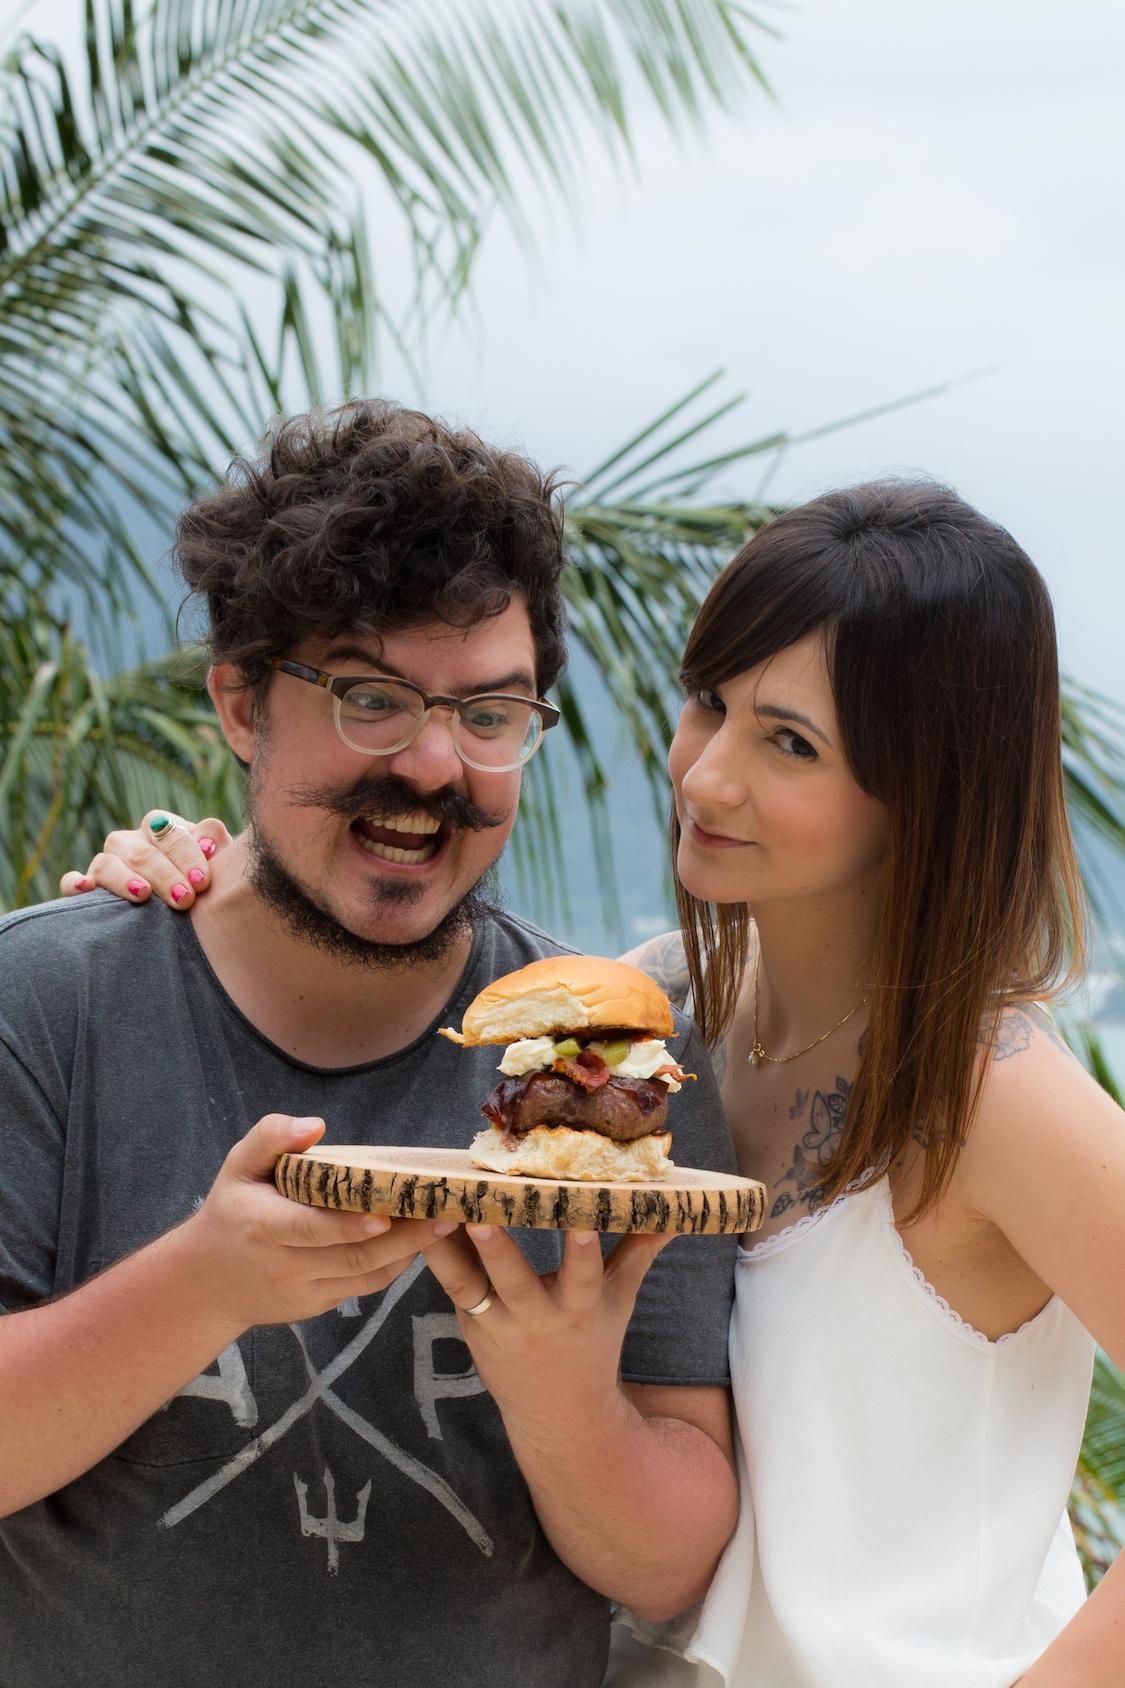 receita-hamburguer-bacon-sour-cream-jalapeno-dani-noce-hunts-3